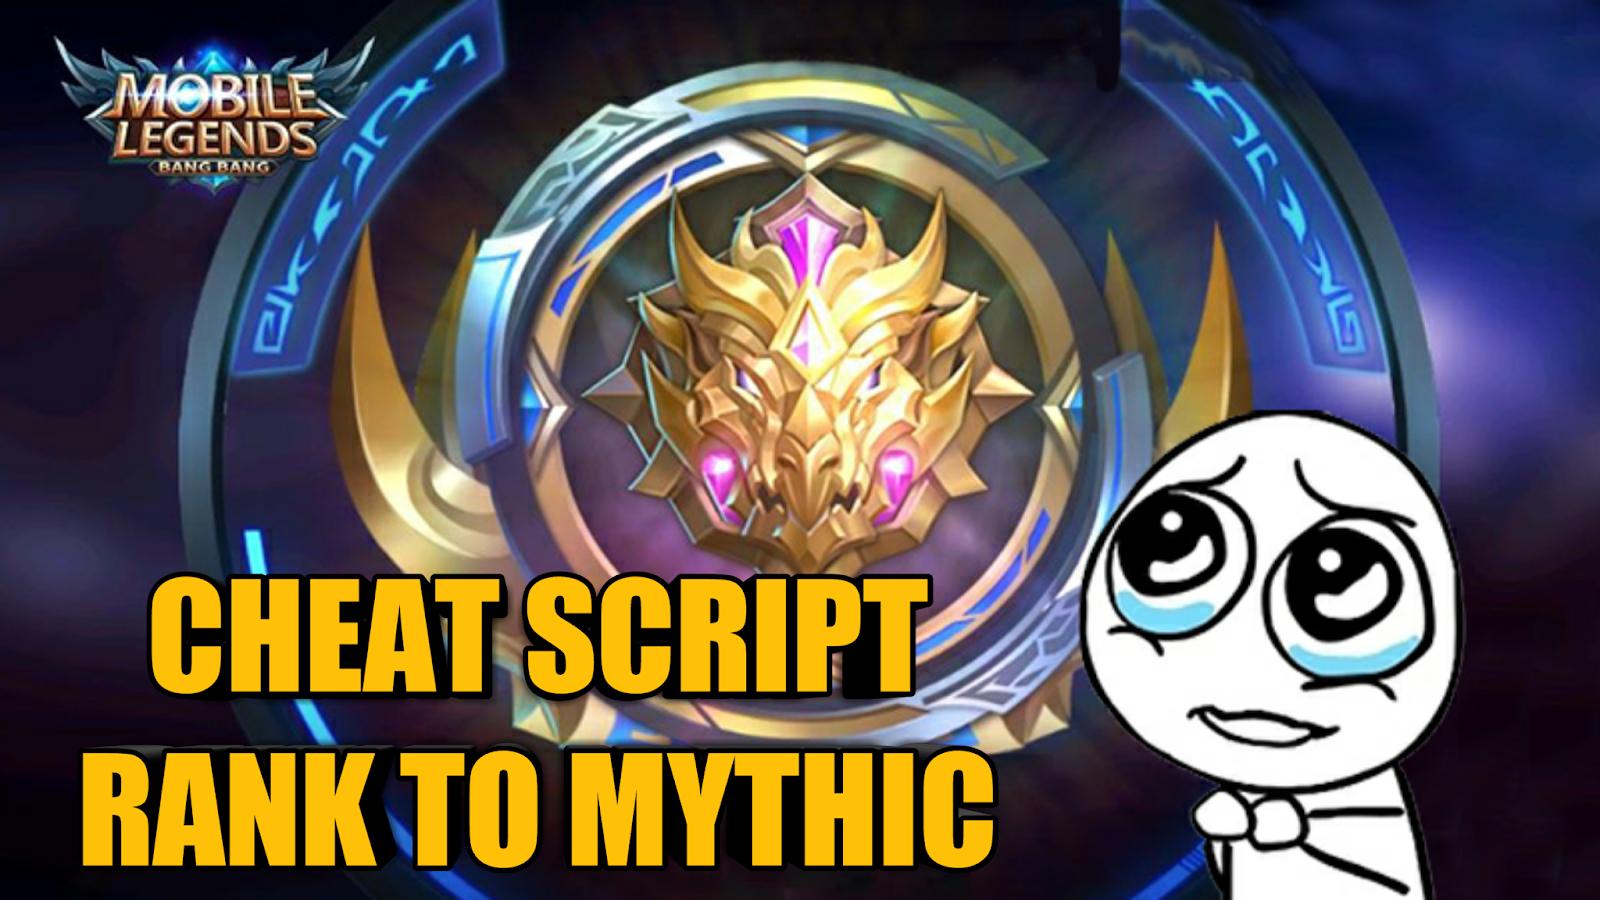 cheat-script-rank-to-mythic